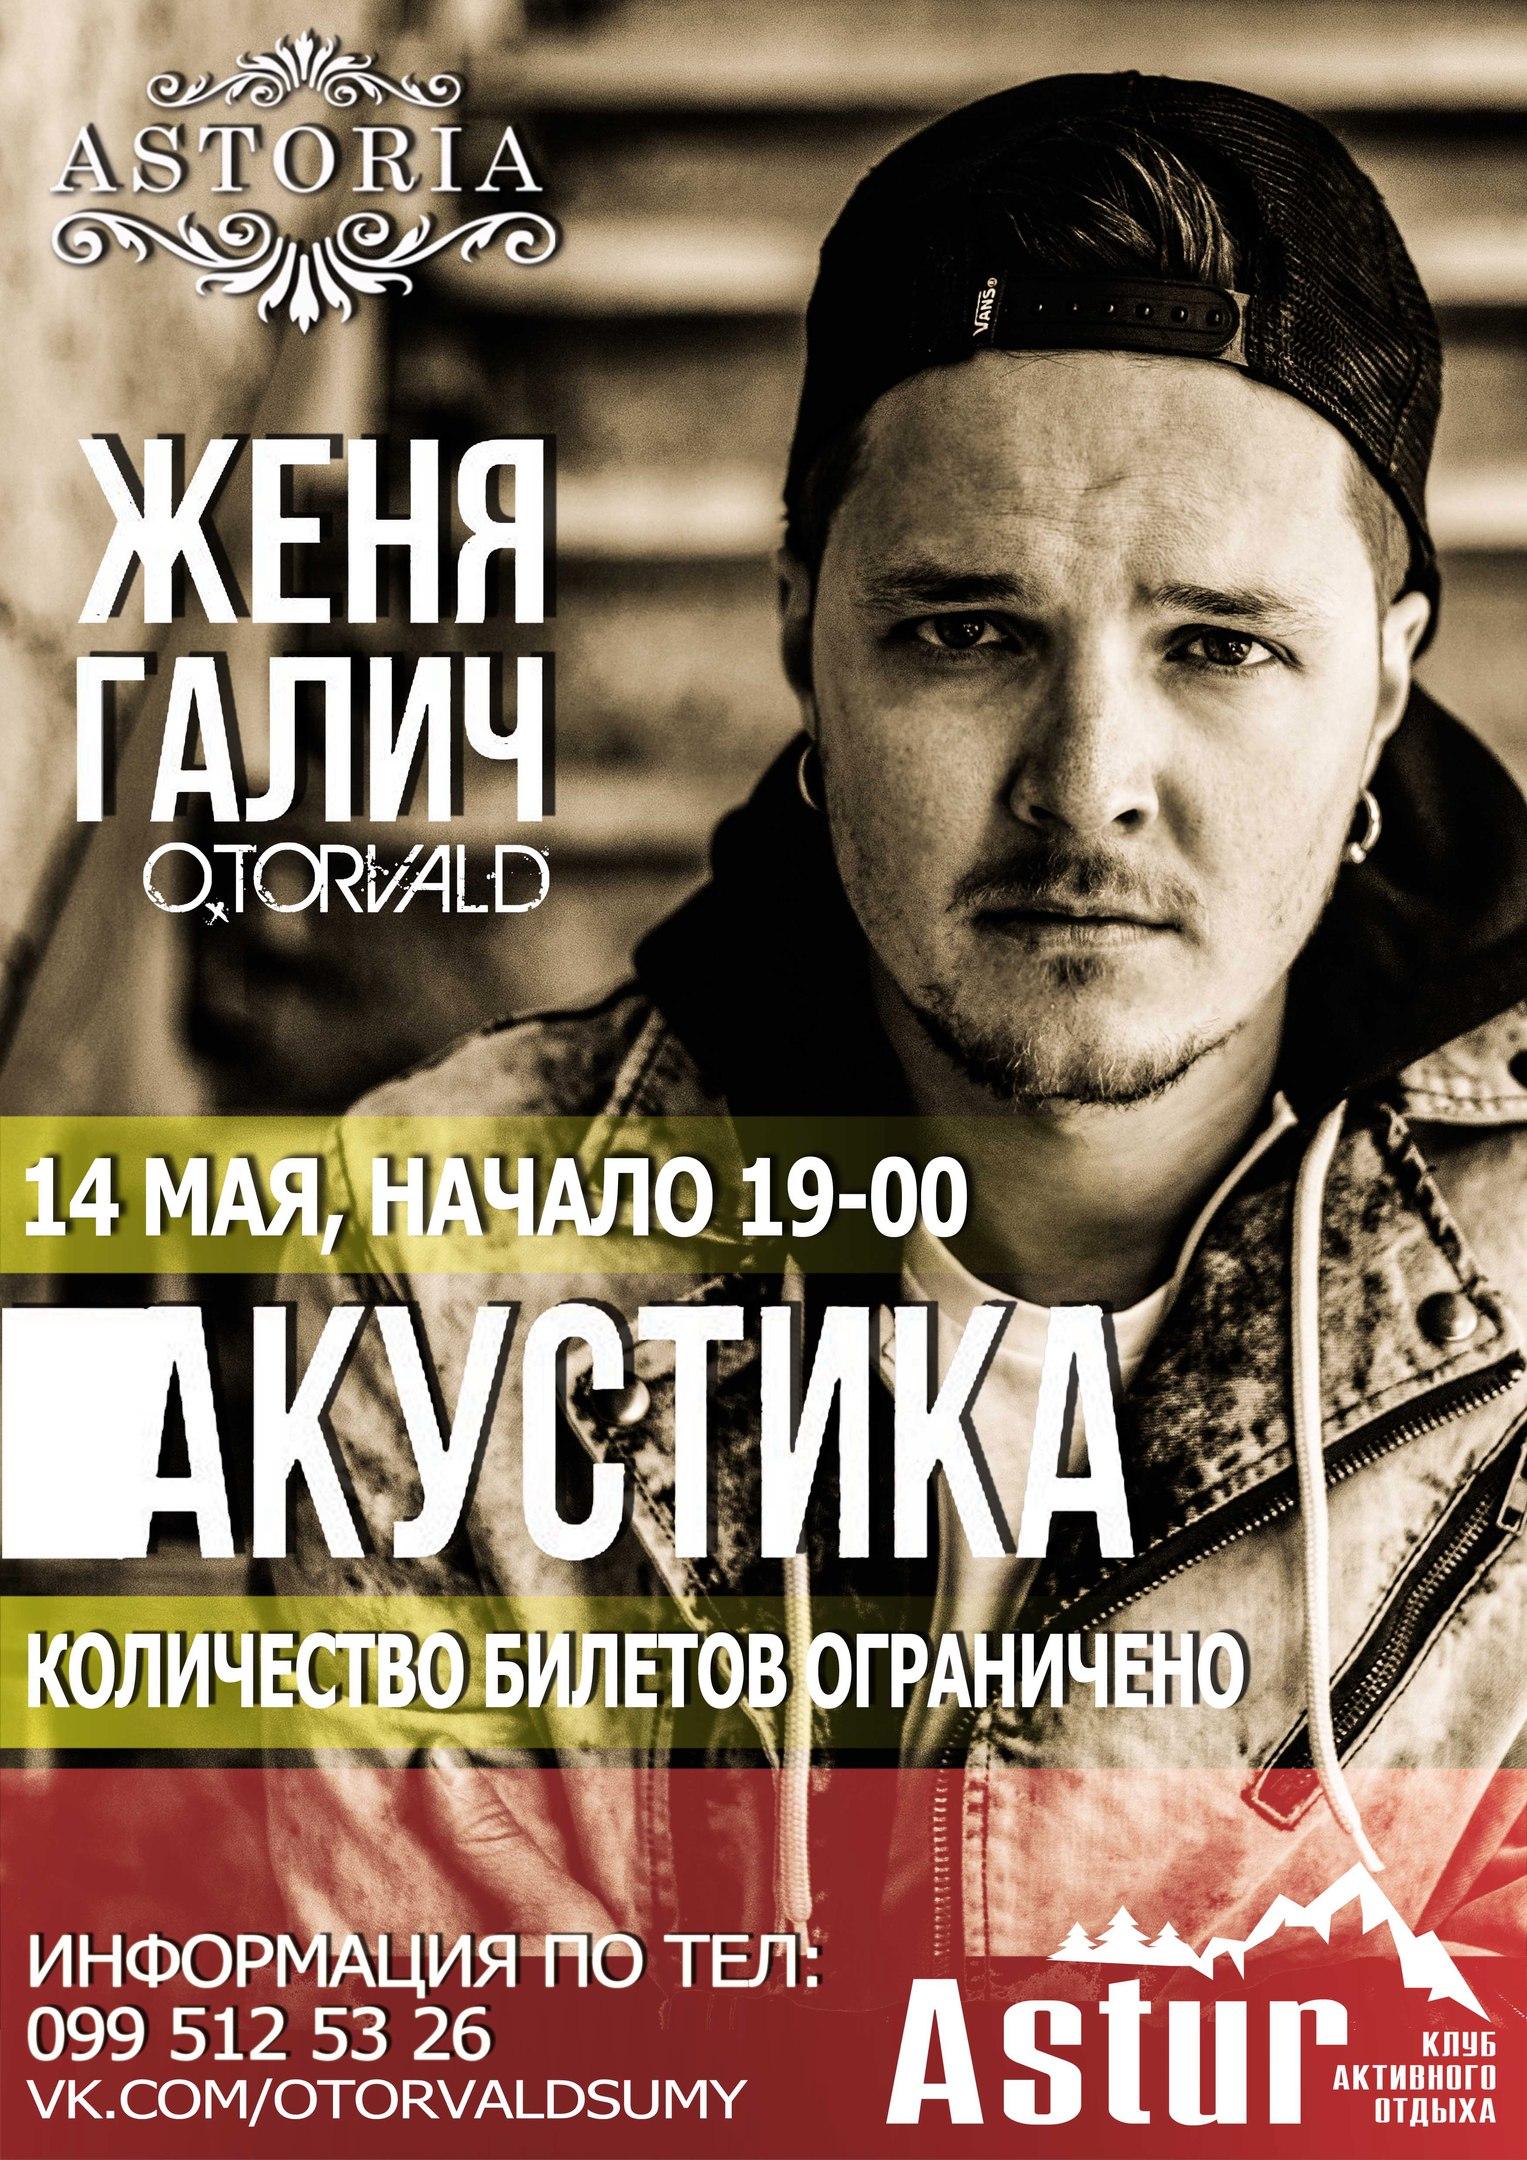 O.Torvald (Акустичний концерт)